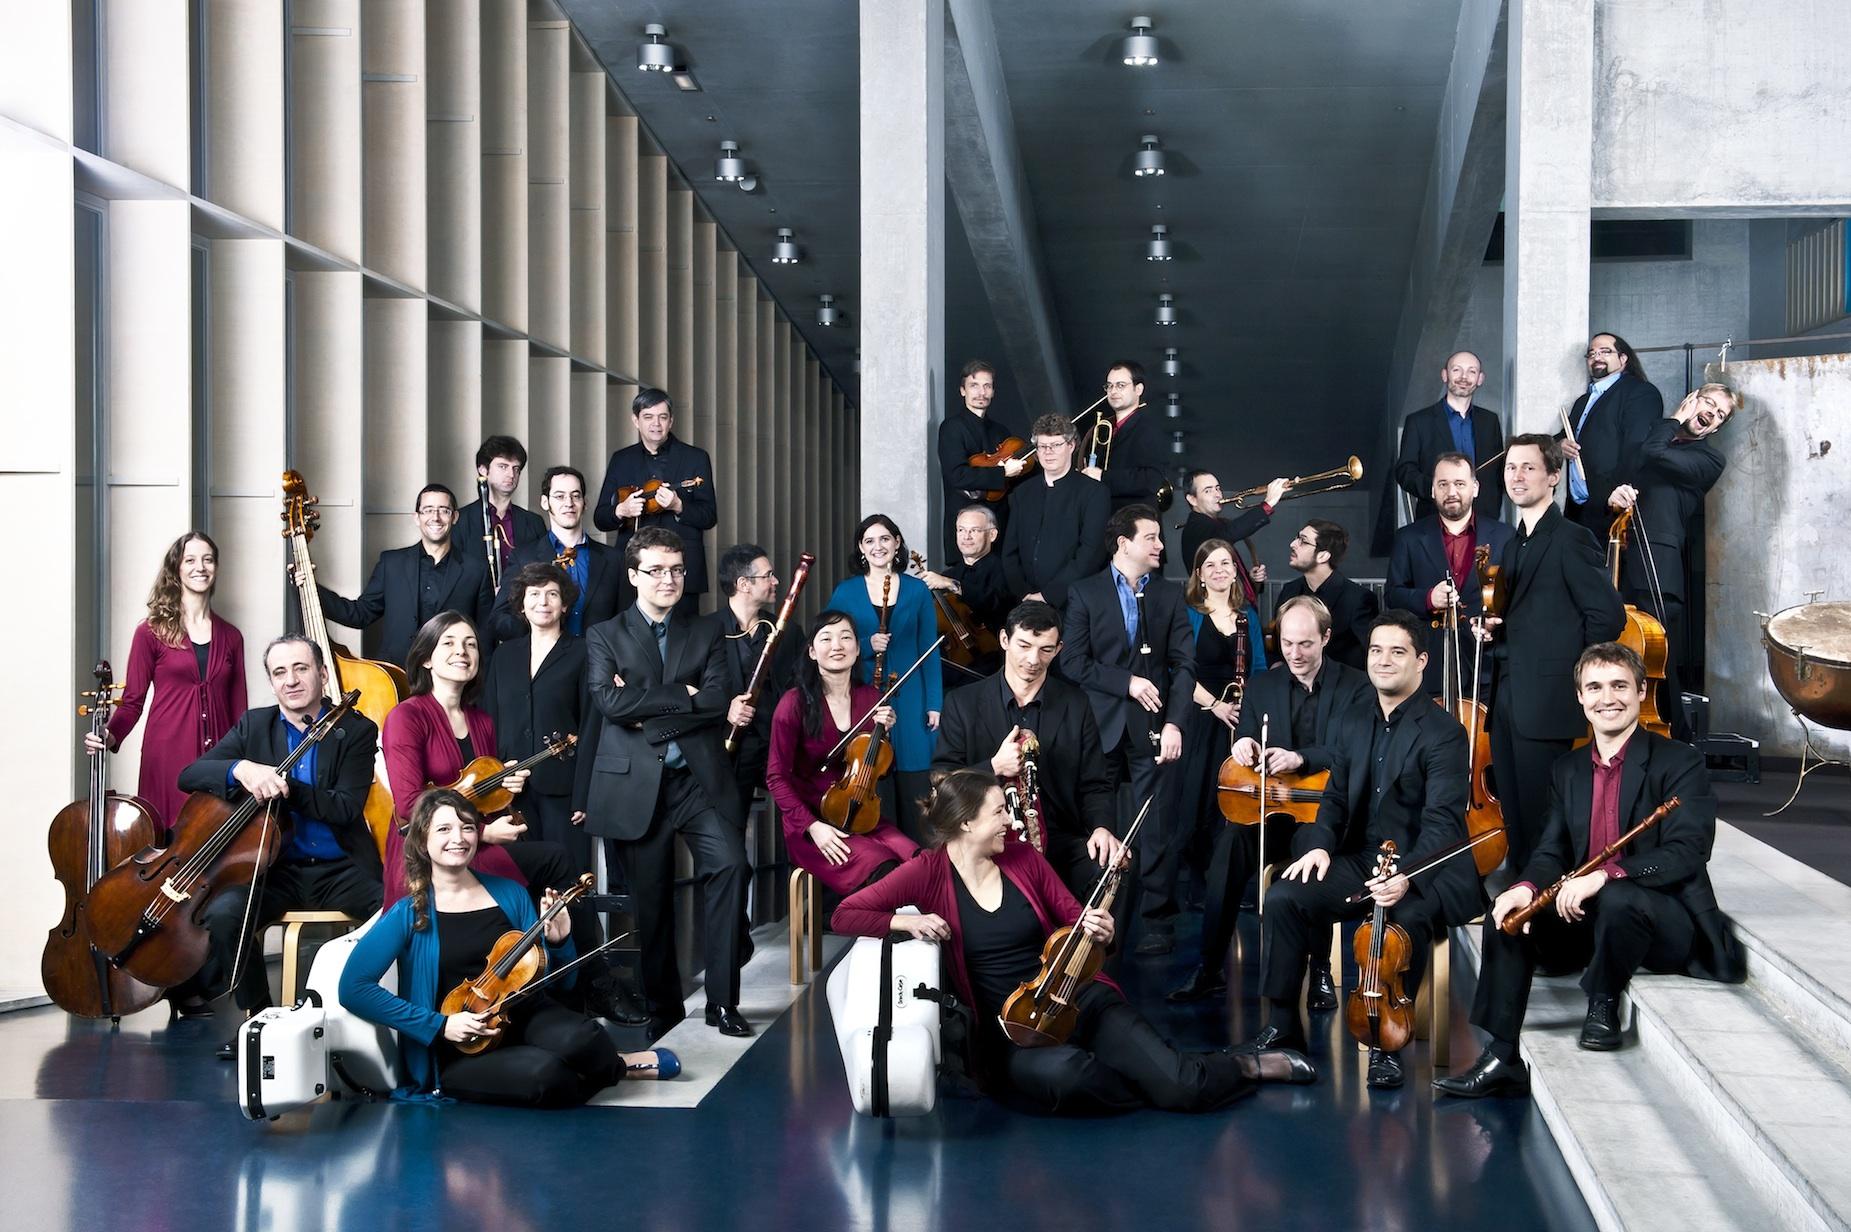 Ensemble Les Ambassadeurs - Festival baroque de Pontoise